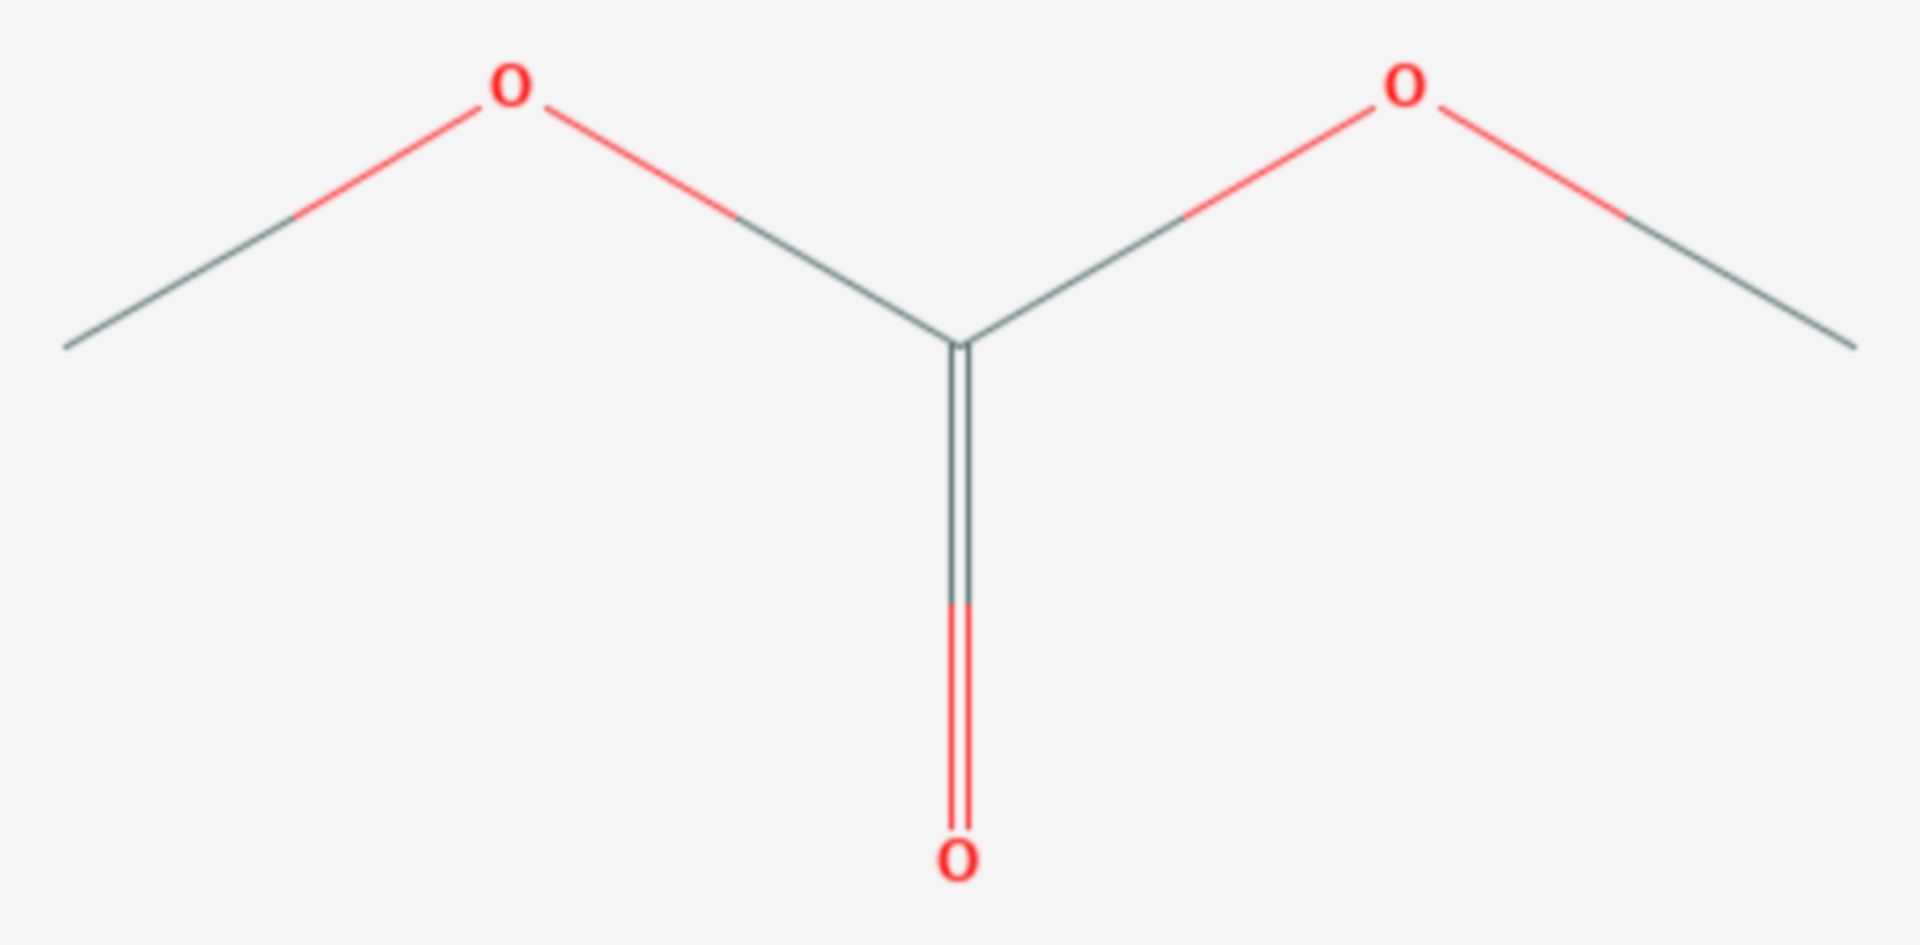 Kohlensäuredimethylester (Strukturformel)